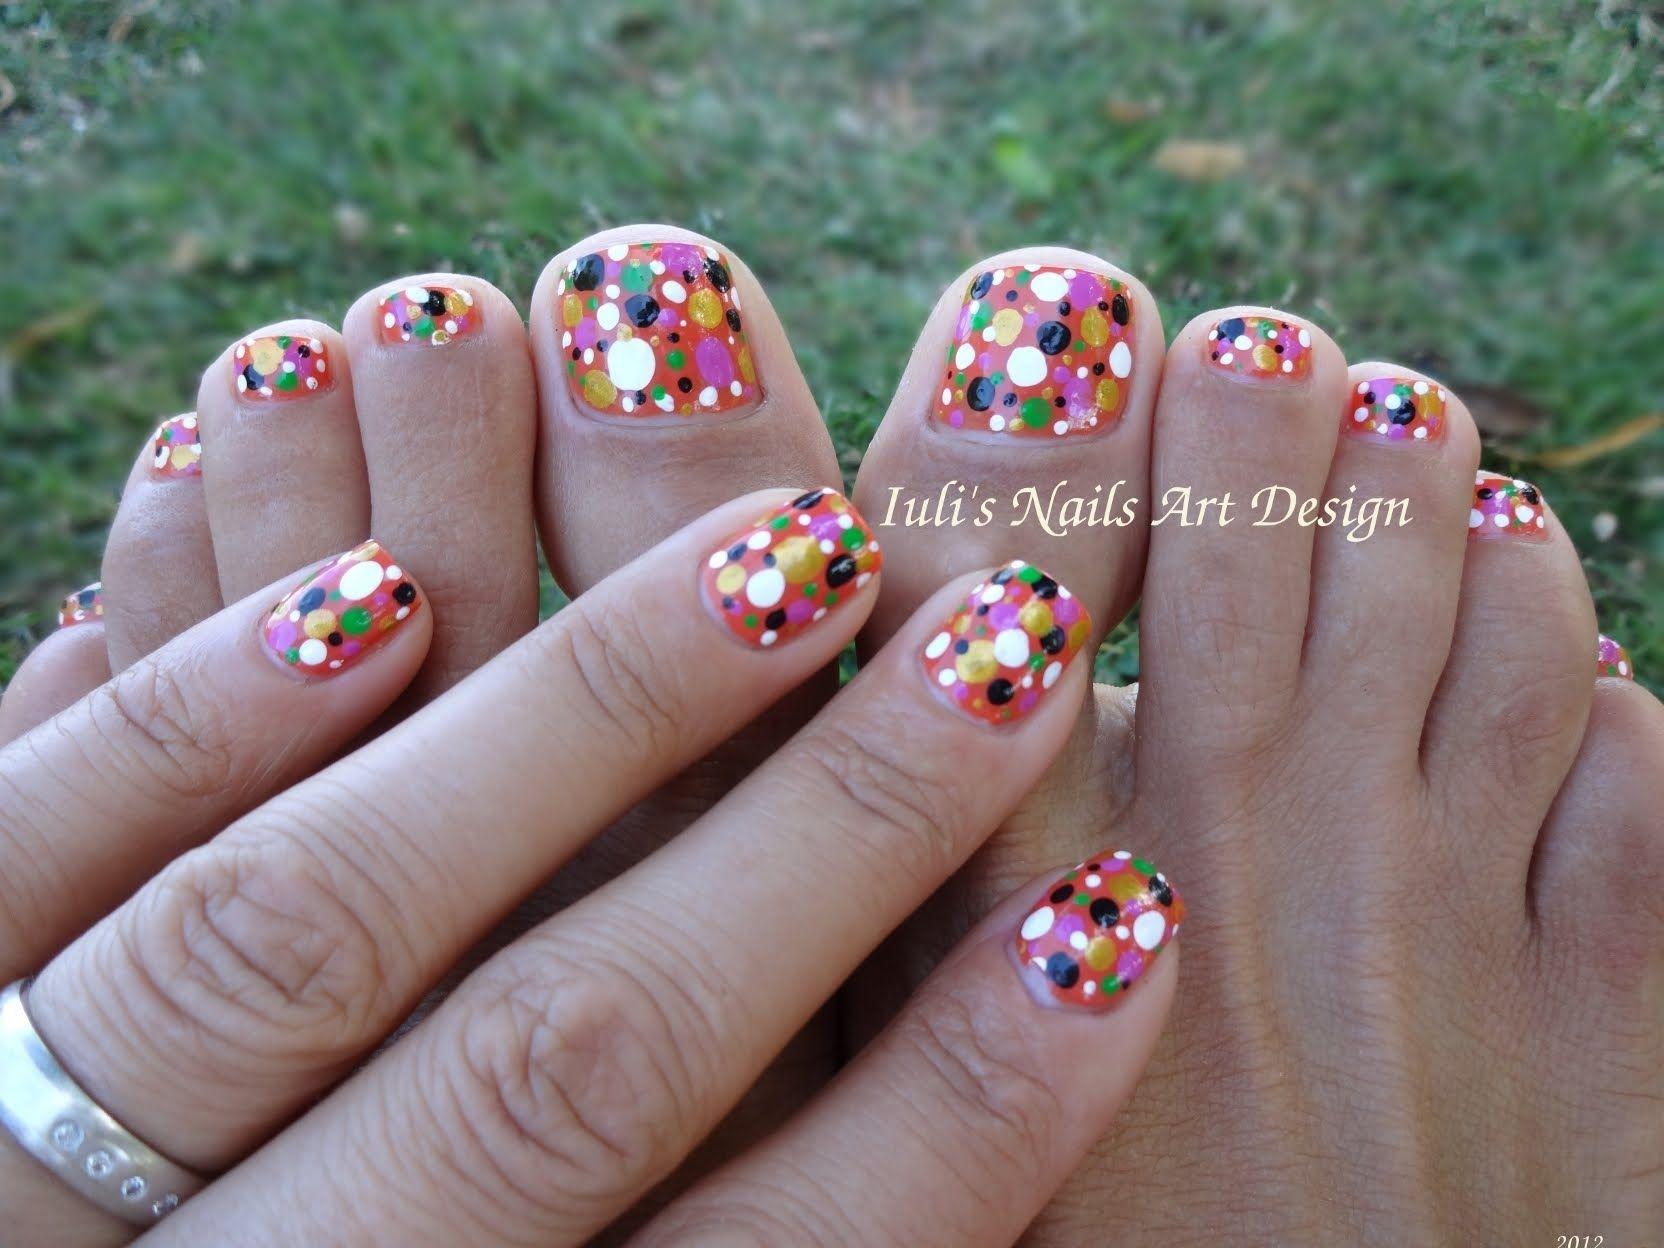 Toes Art Design Colortul Dots Easy Beginners Live Tutorial Summer